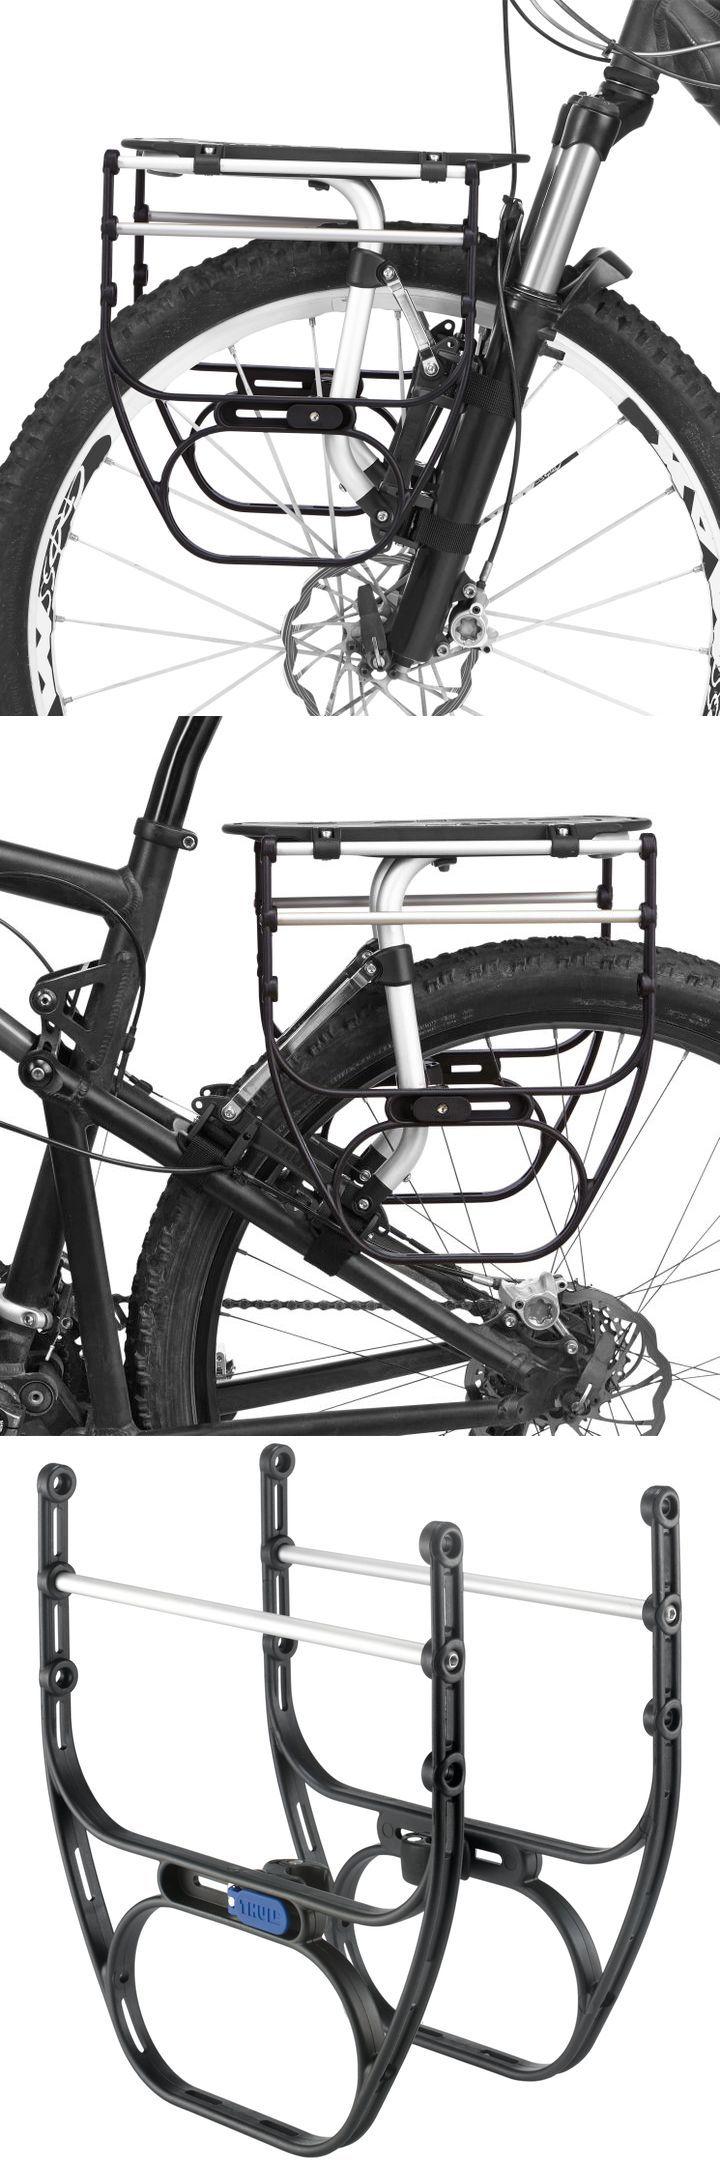 supports lateraux pour porte bagages packn pedal de thule